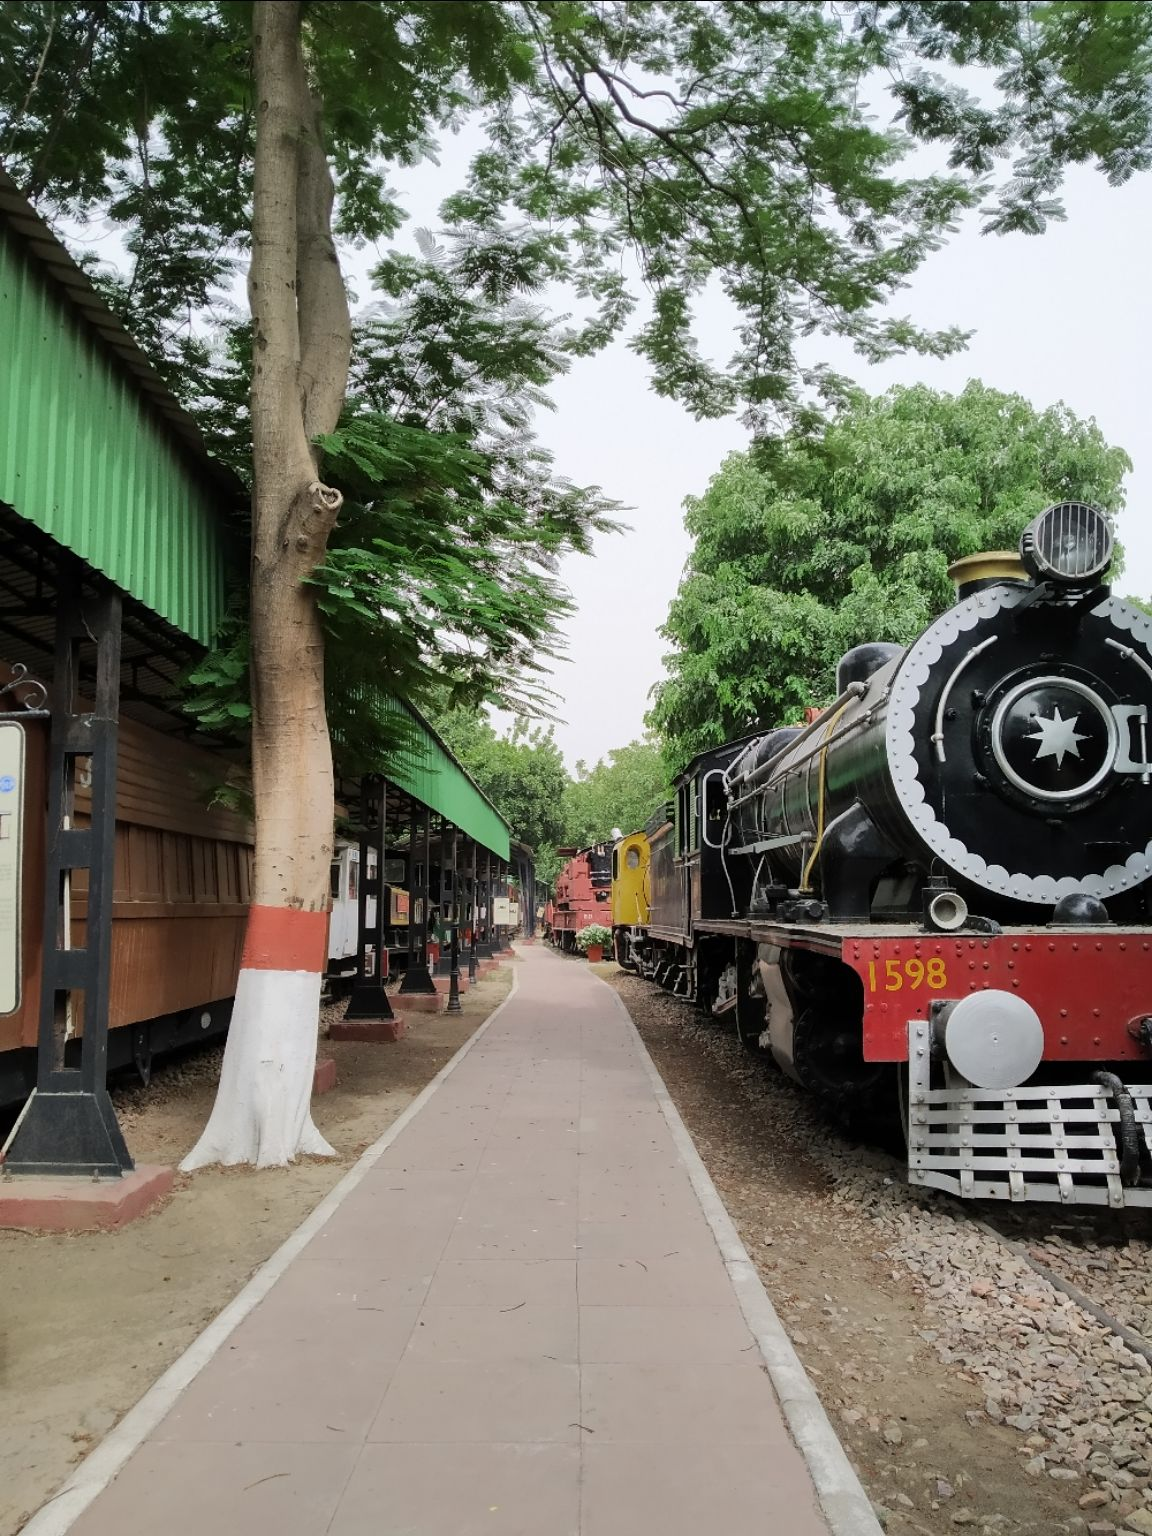 Photo of National Rail Museum By Priya Kamra